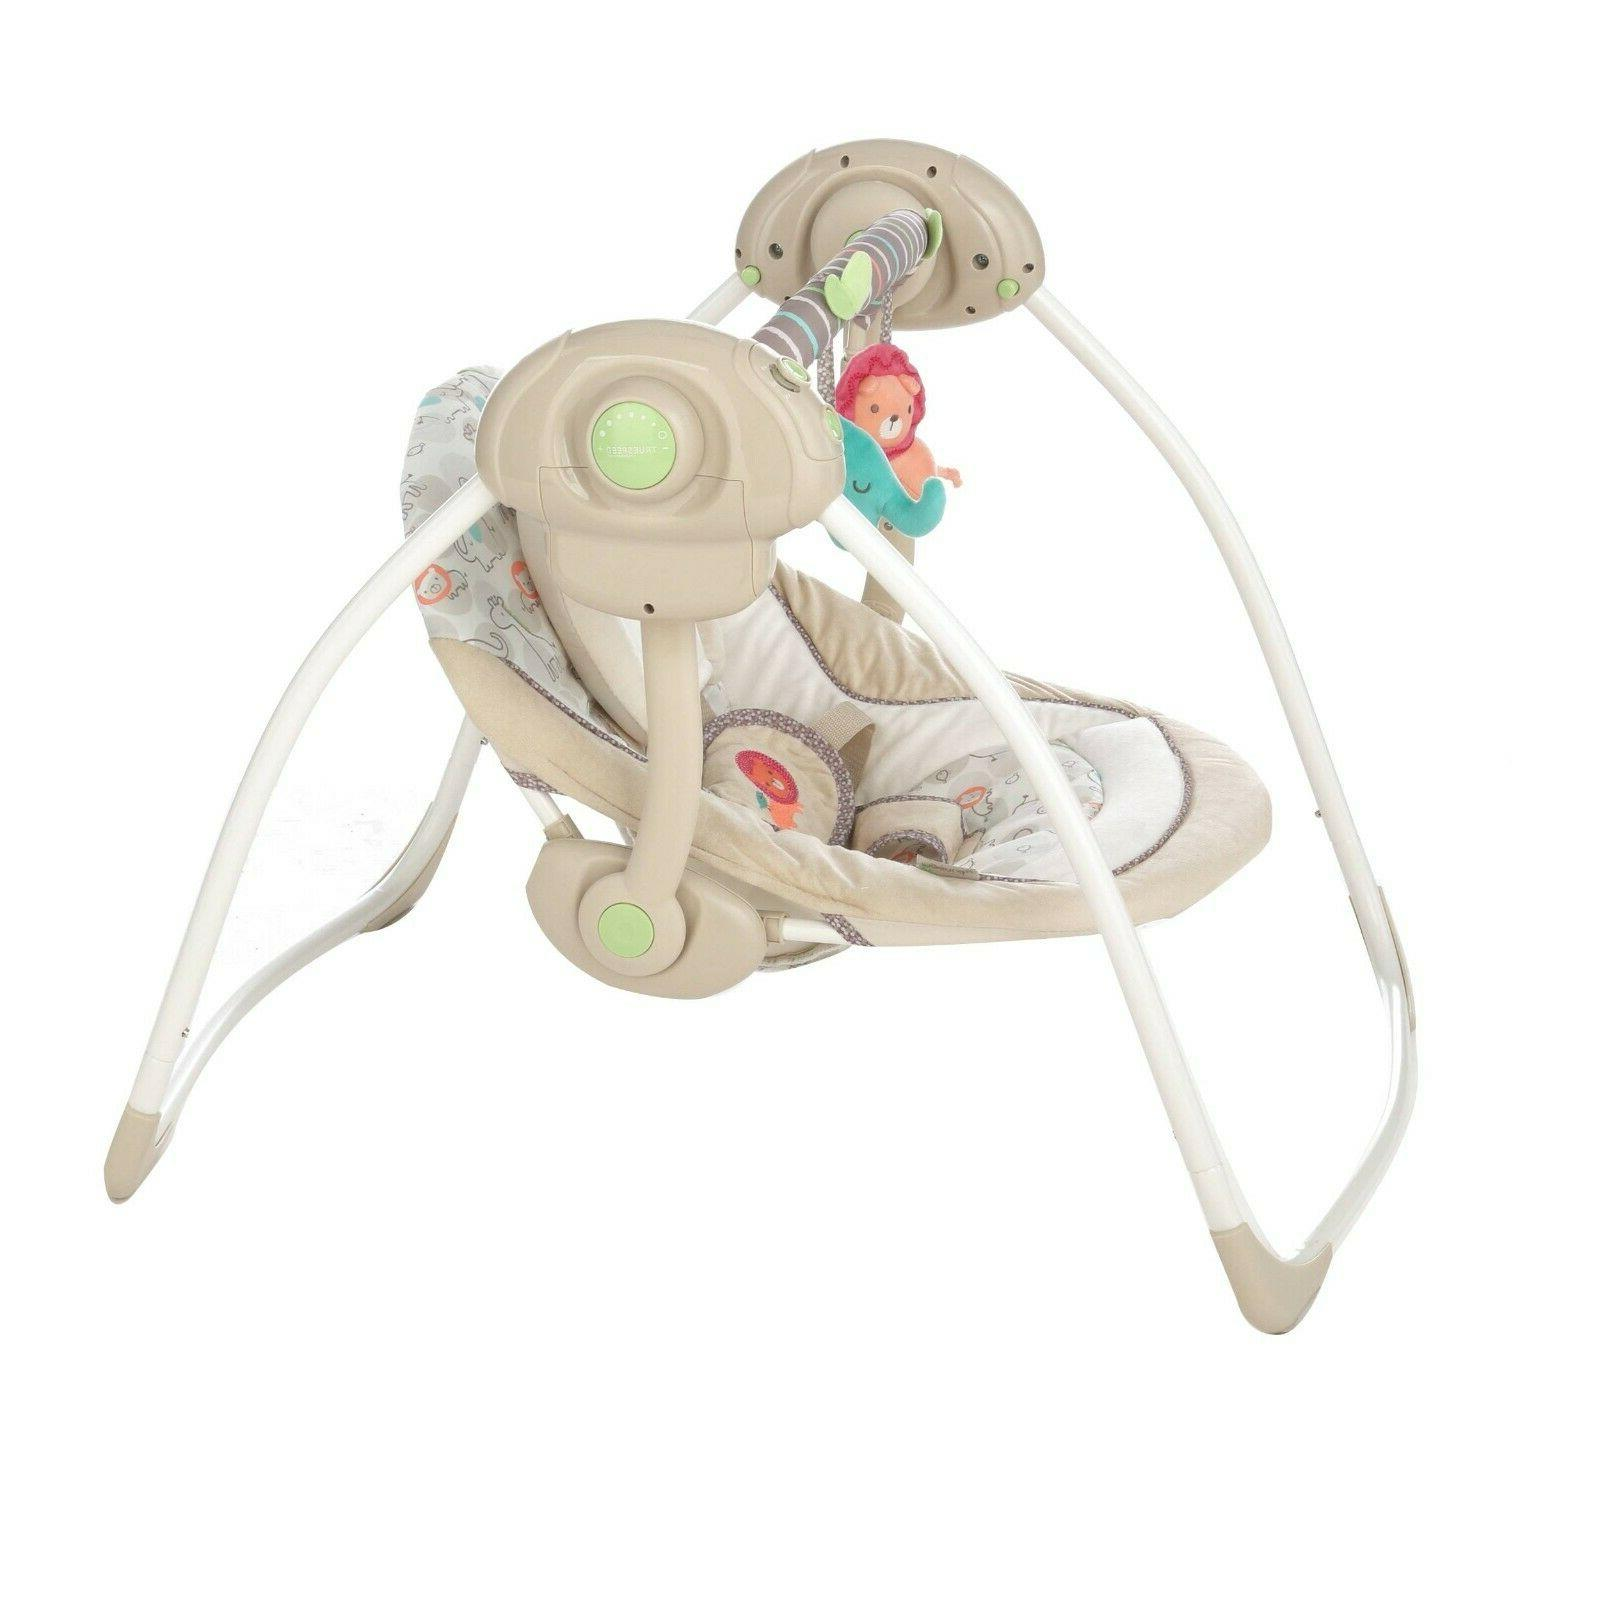 Baby Swing Rocker Portable Electric W/ Sounds